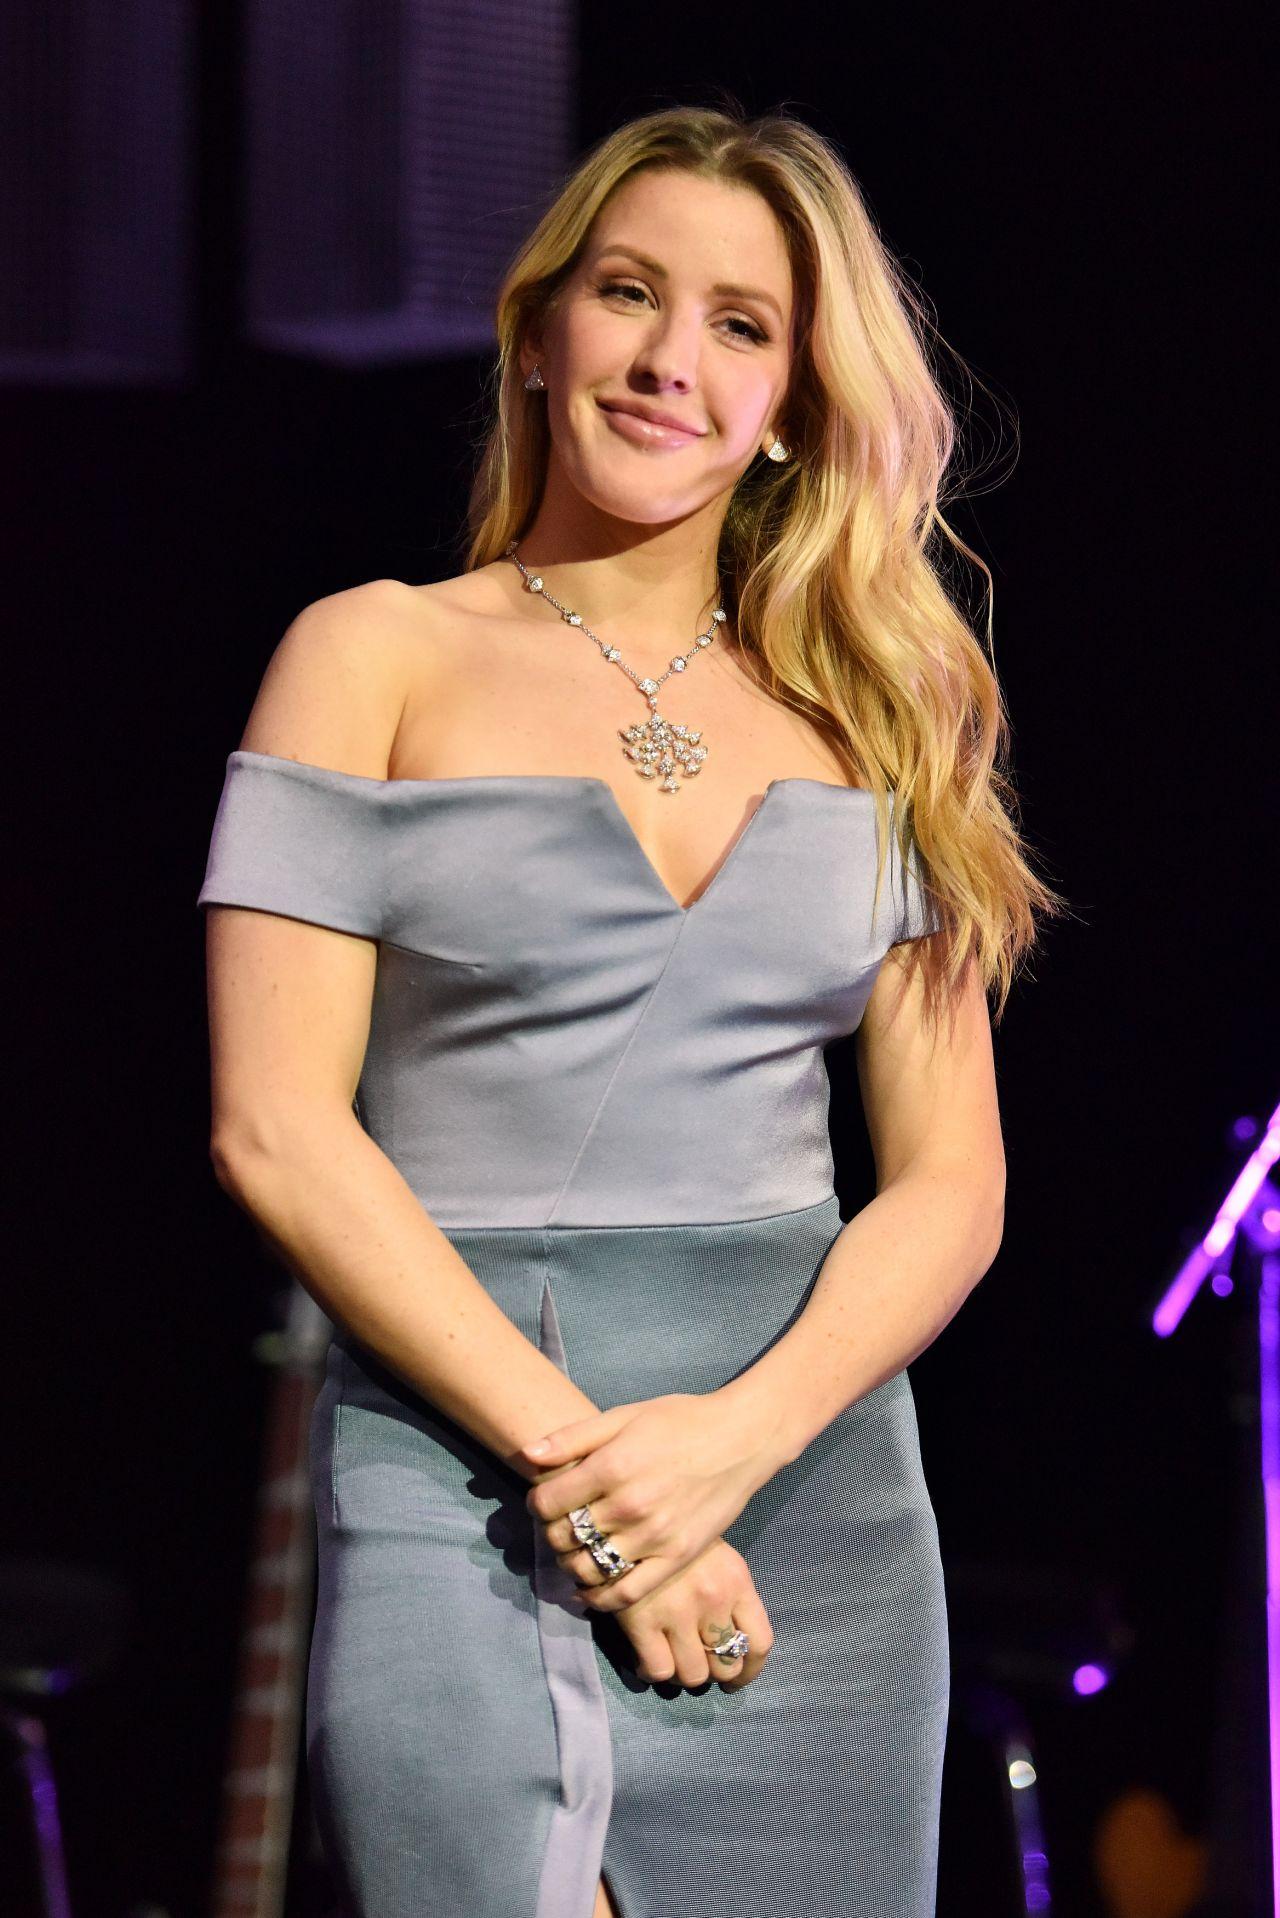 Ellie Goulding Latest Photos Celebmafia